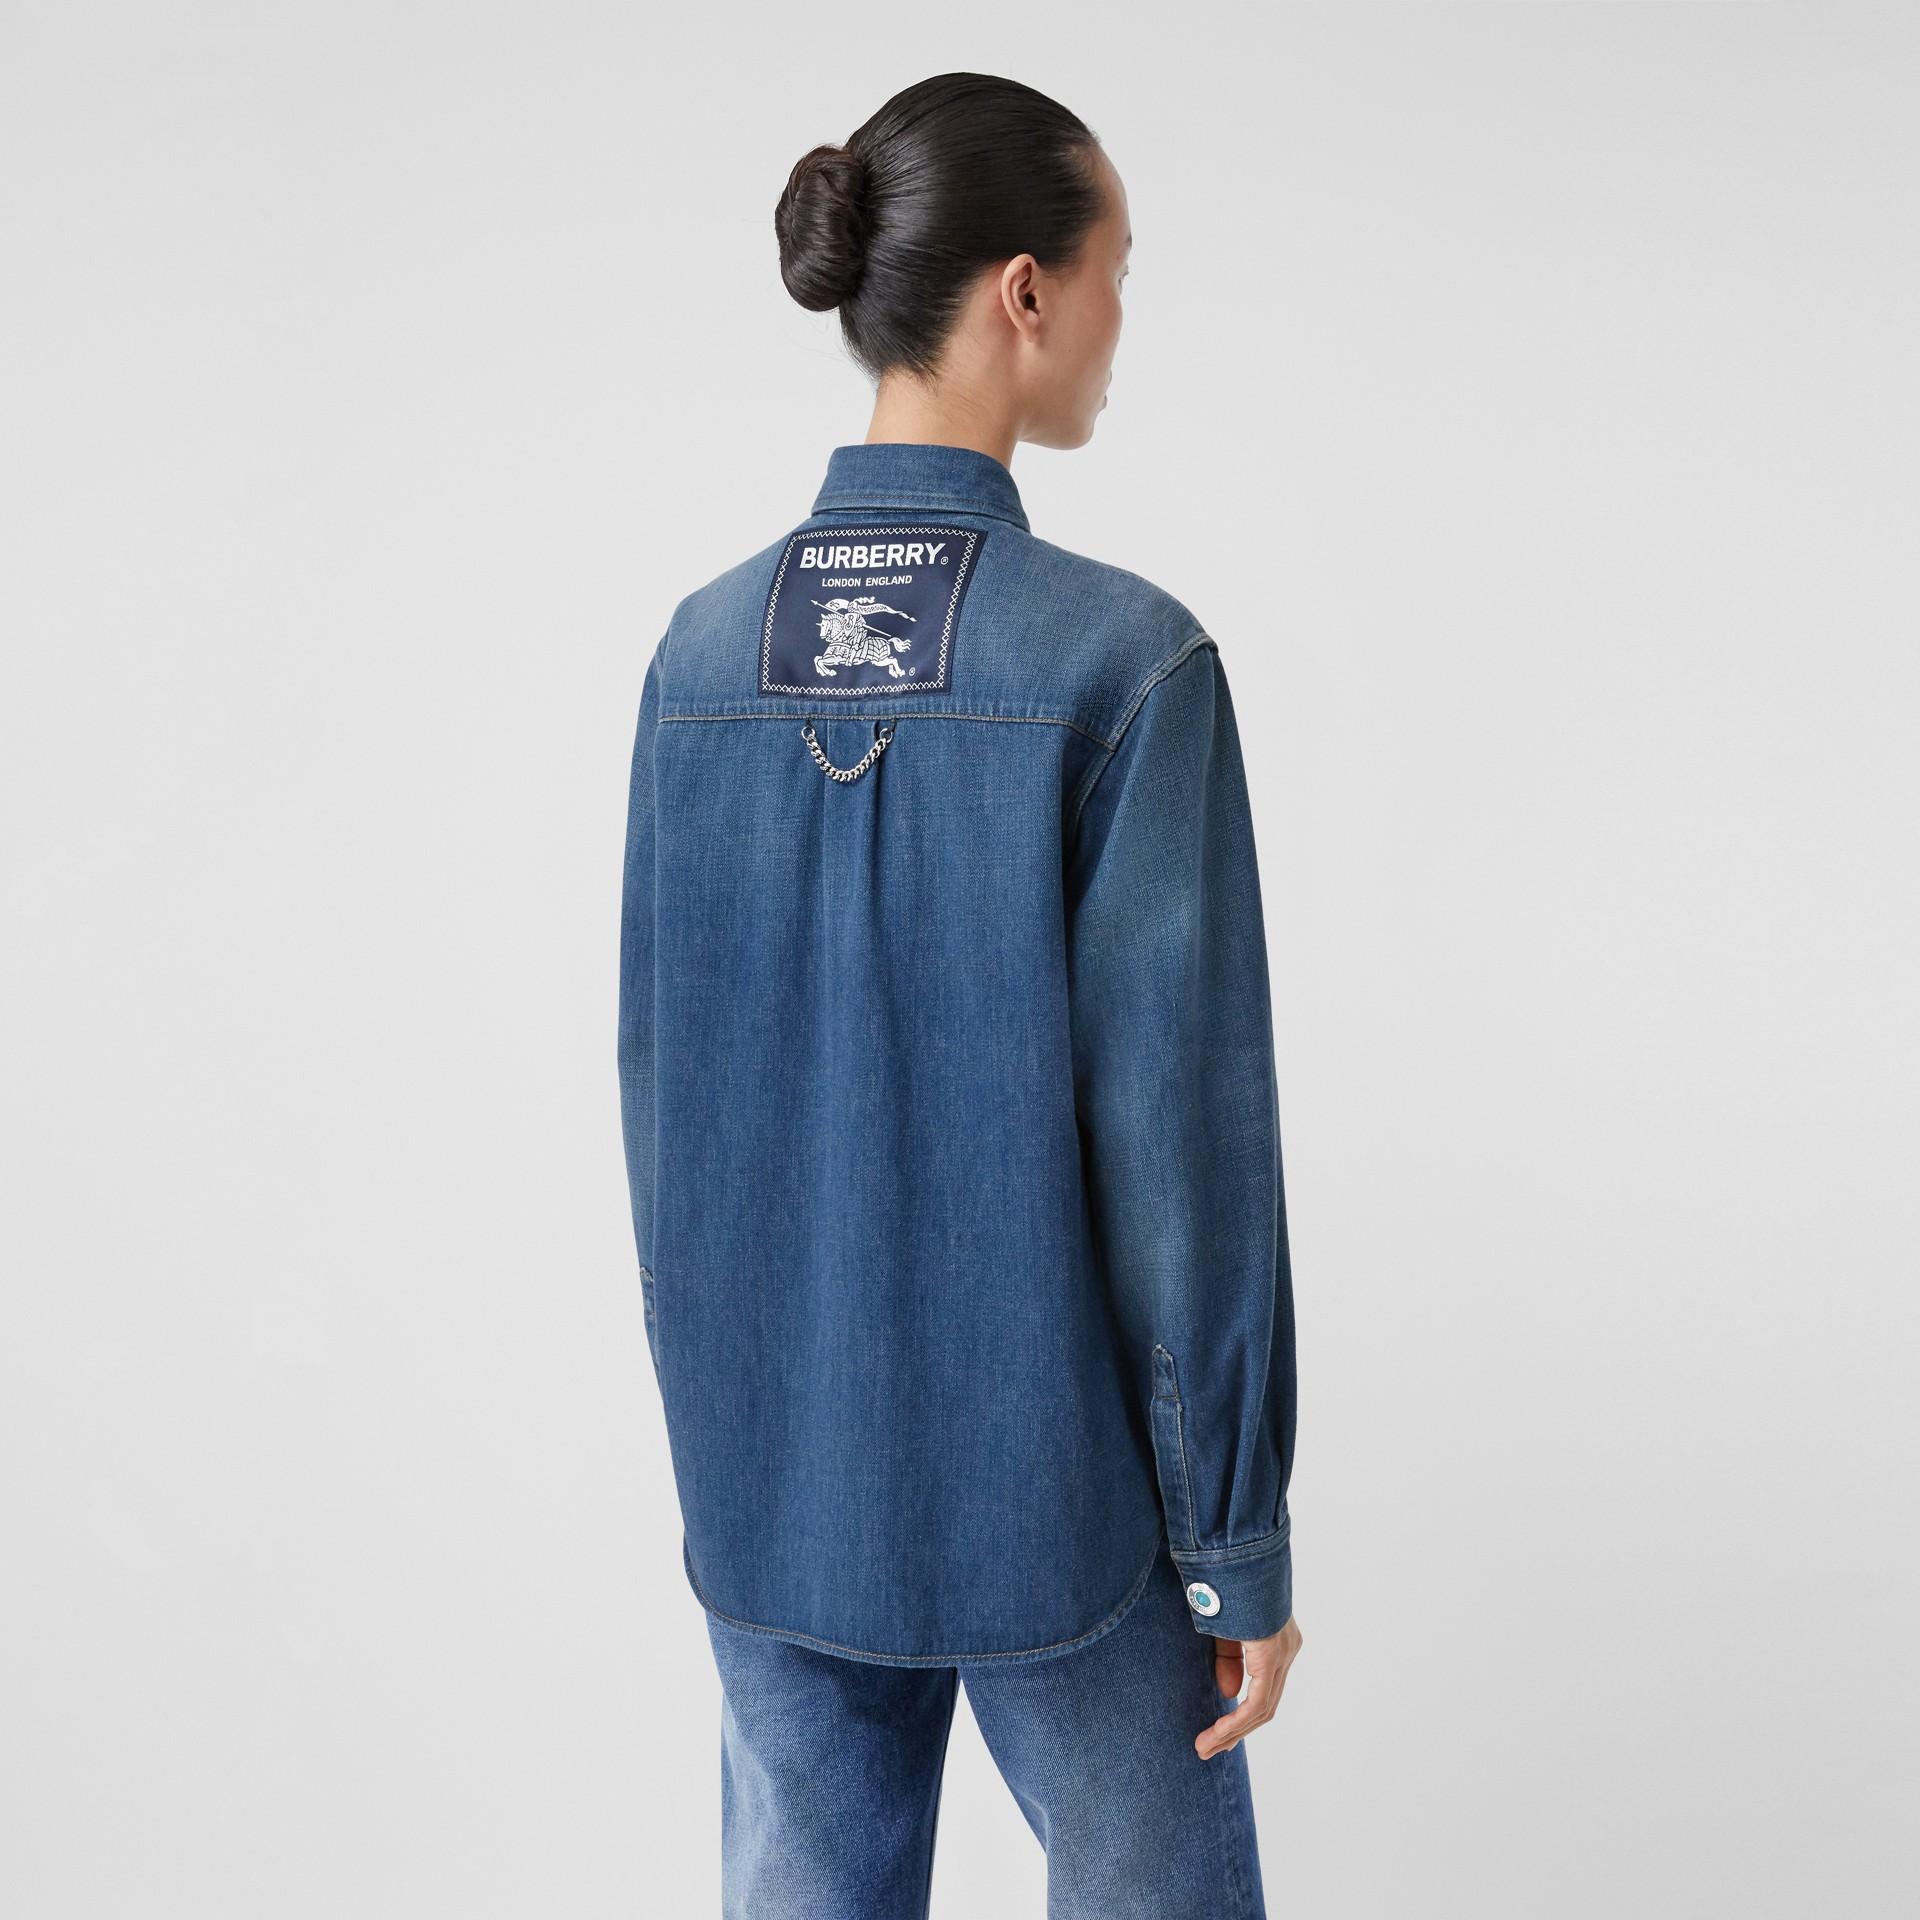 Logo Appliqué Denim Shirt in Indigo - Women | Burberry - gallery image 2